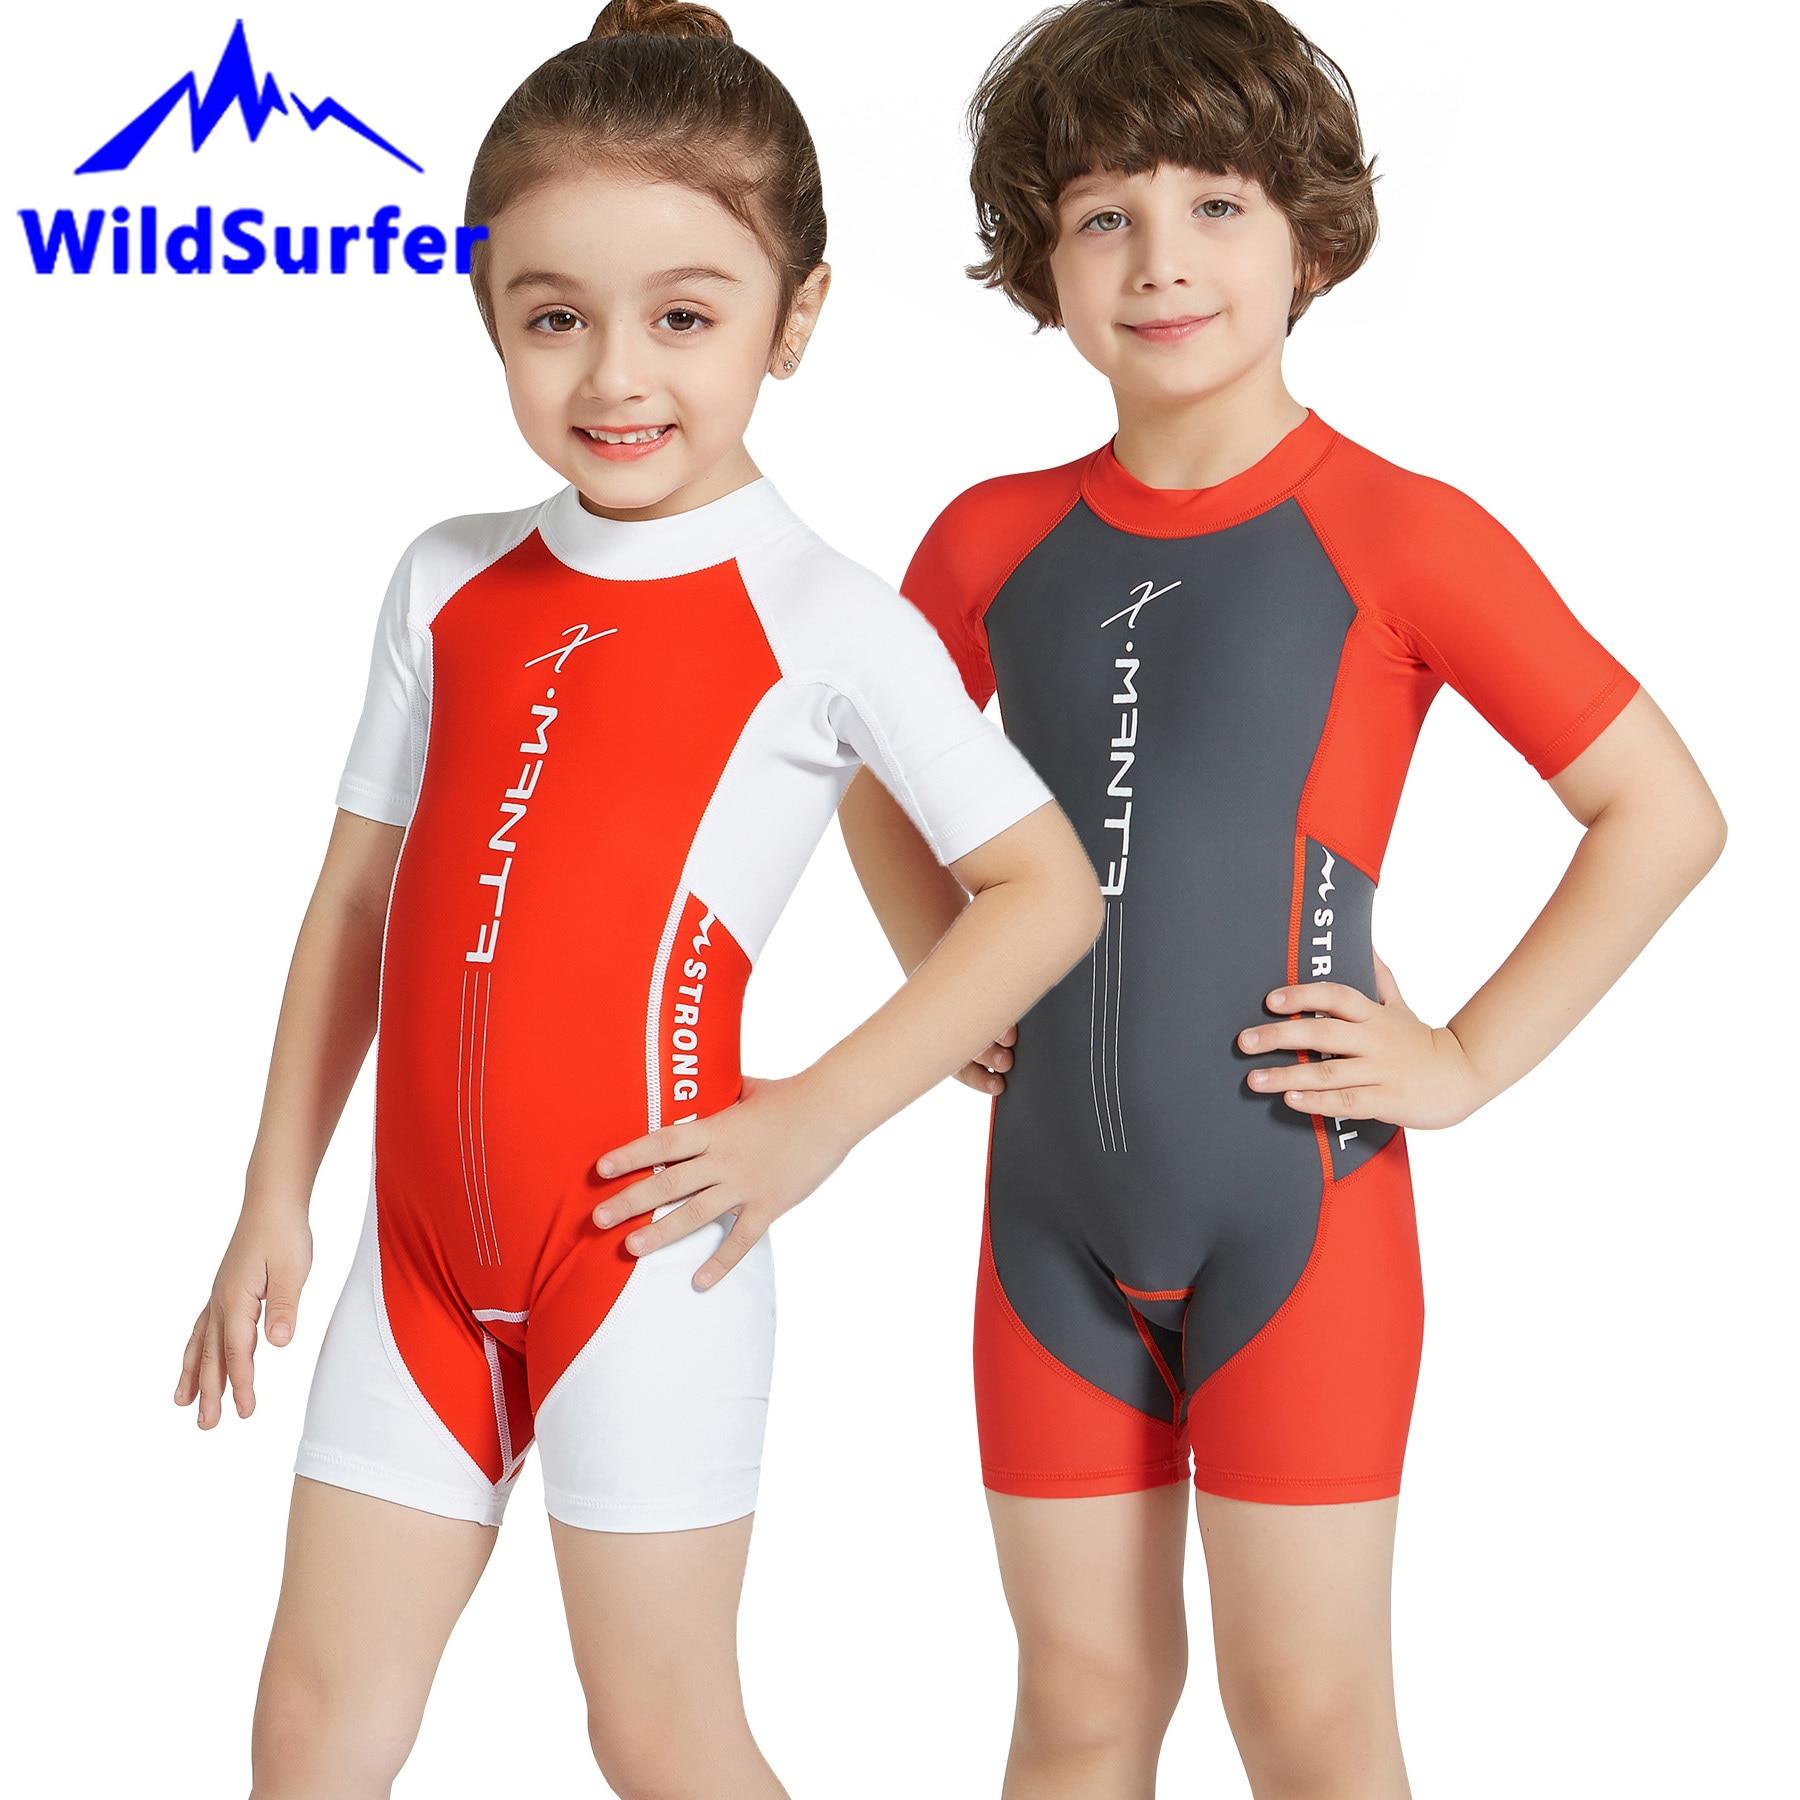 WildSurfer Kids Swimsuit One-Piece Rash Guard Girls 2-12 Years Boys Short Sleeve Back Zipper Dive Swimwear UPF50+ Sunscreen W123